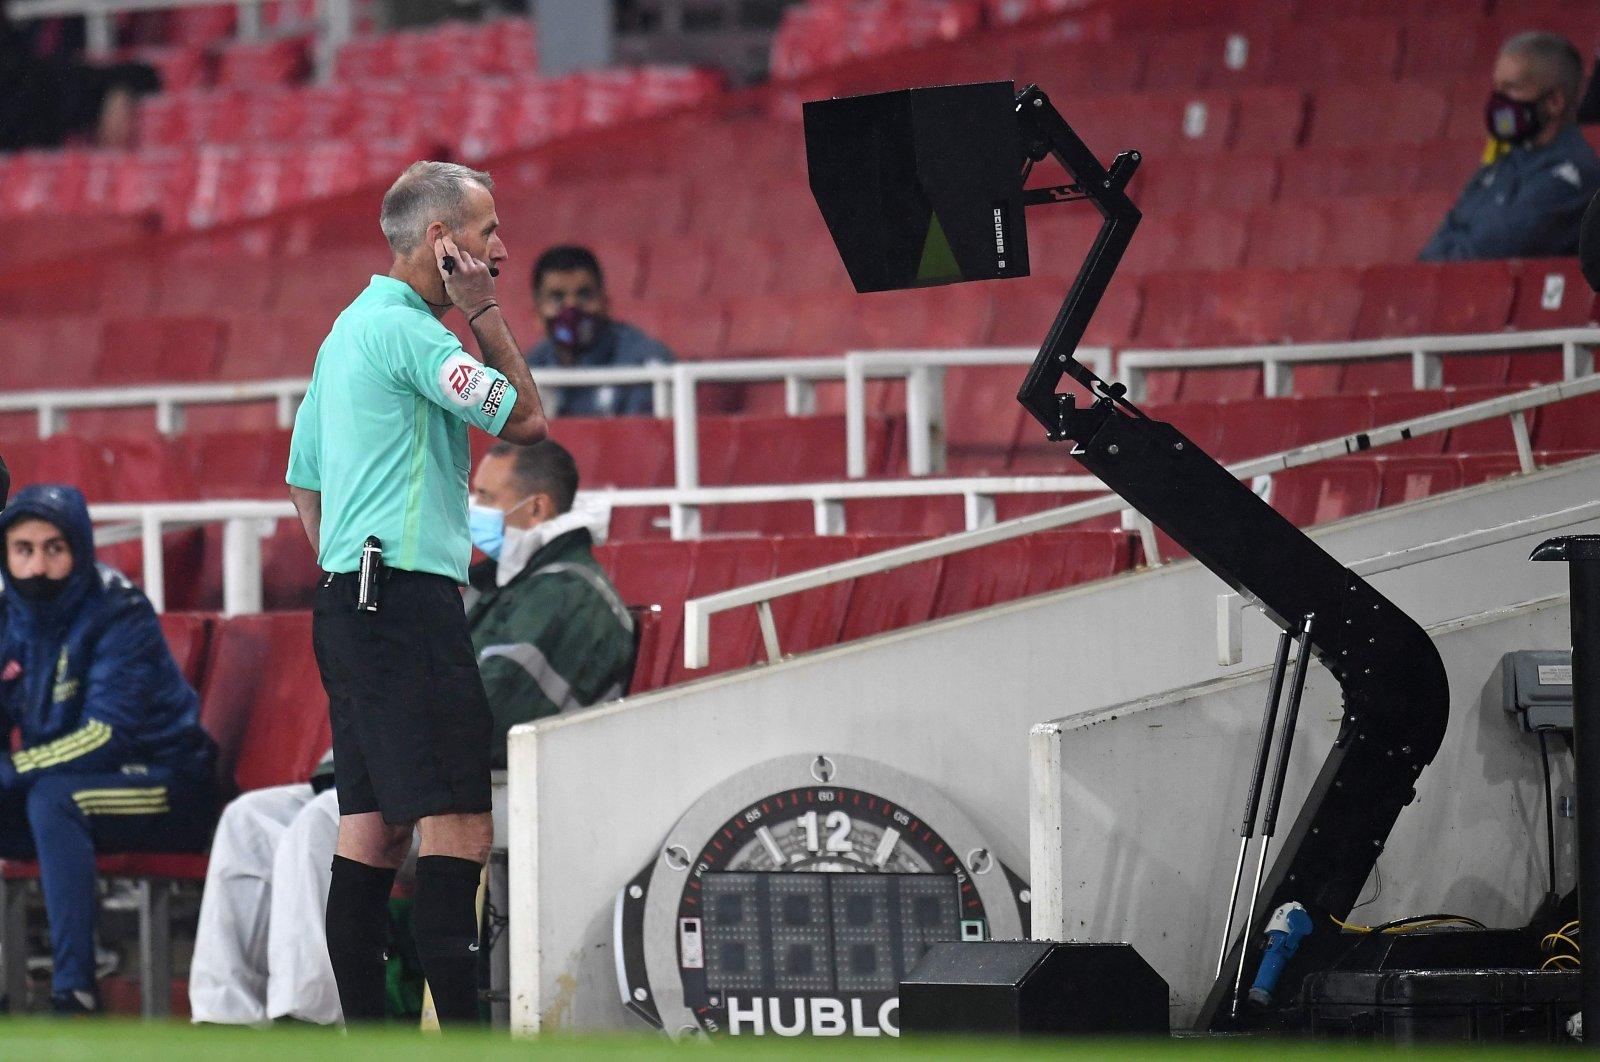 Referee Martin Atkinson reviews a goal by Aston Villa during an Arsenal-Aston Villa game, in London, Britain, Nov. 8, 2020. (AFP Photo)